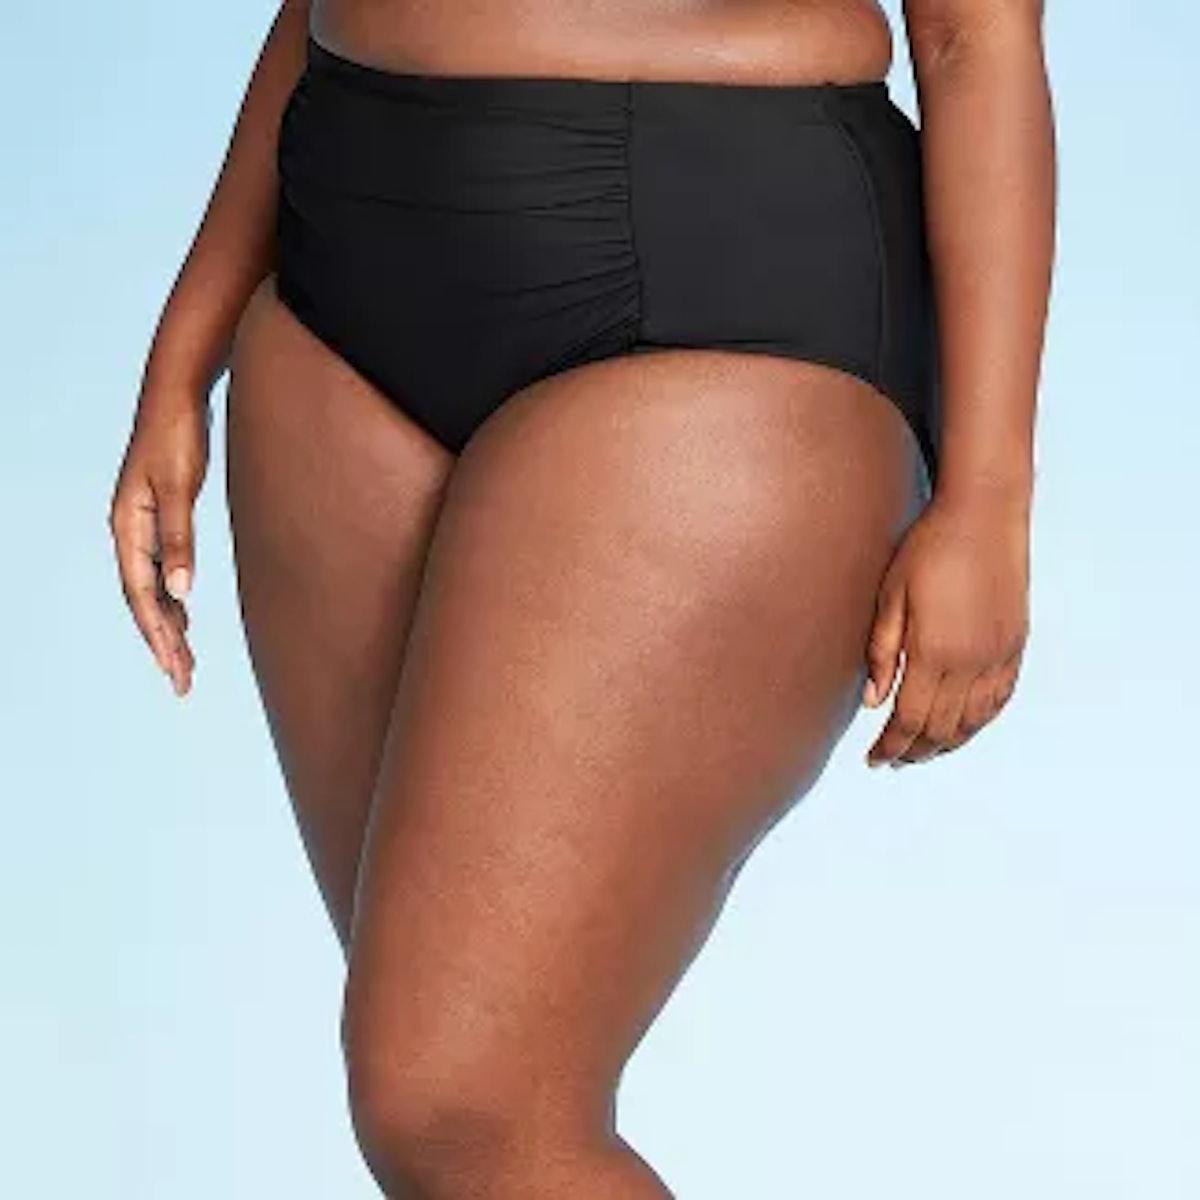 Sea Angel Women's Plus Size High Waist Bikini Bottom